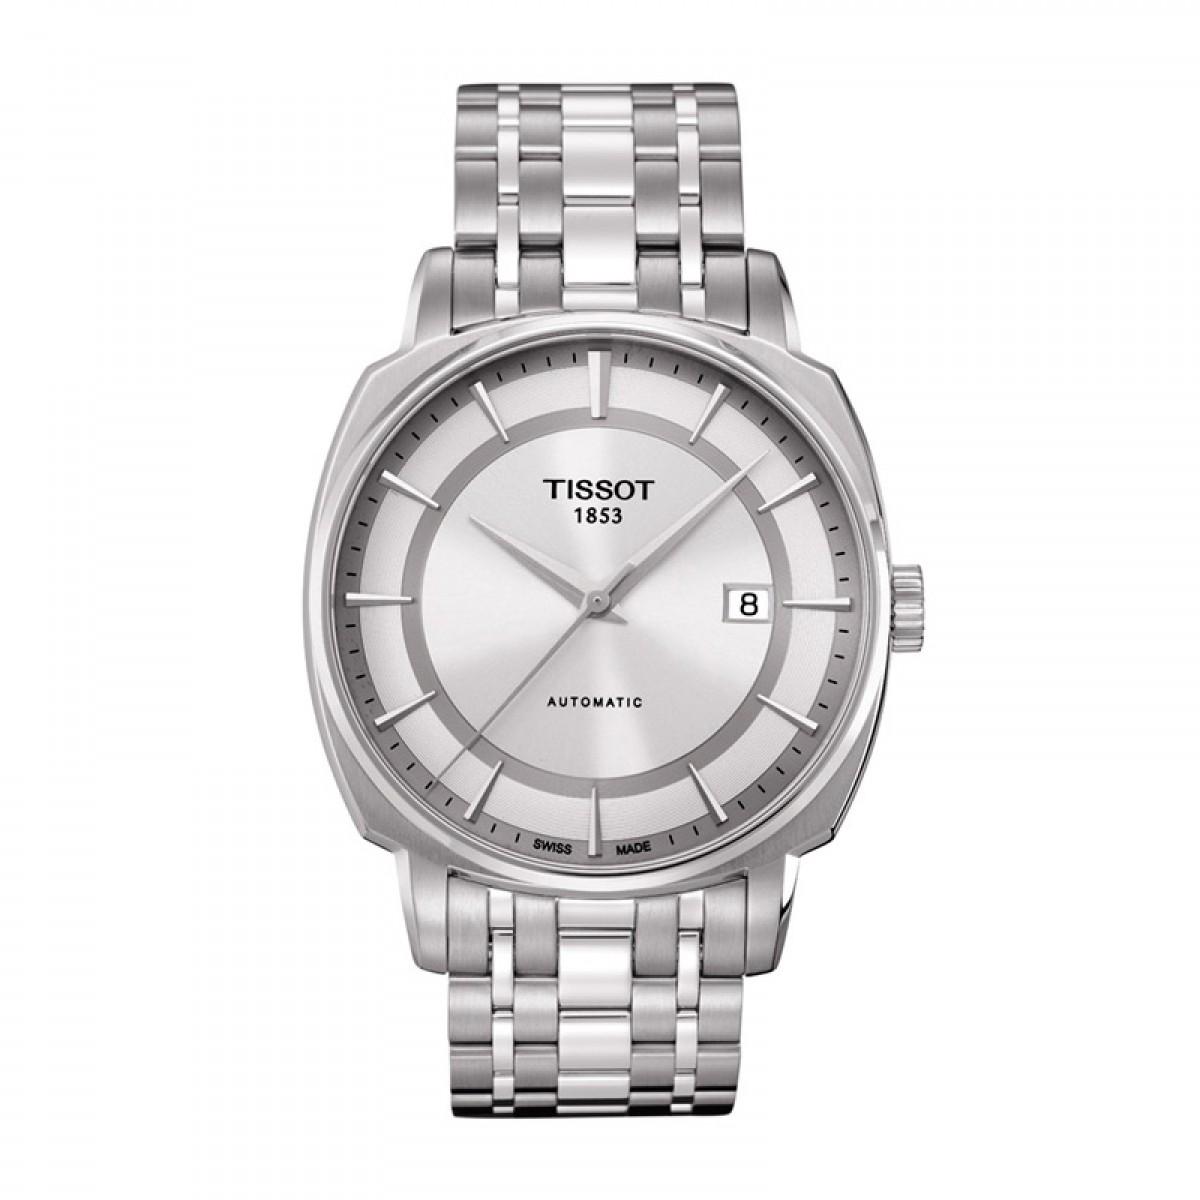 Часовник Tissot T059.507.11.031.00